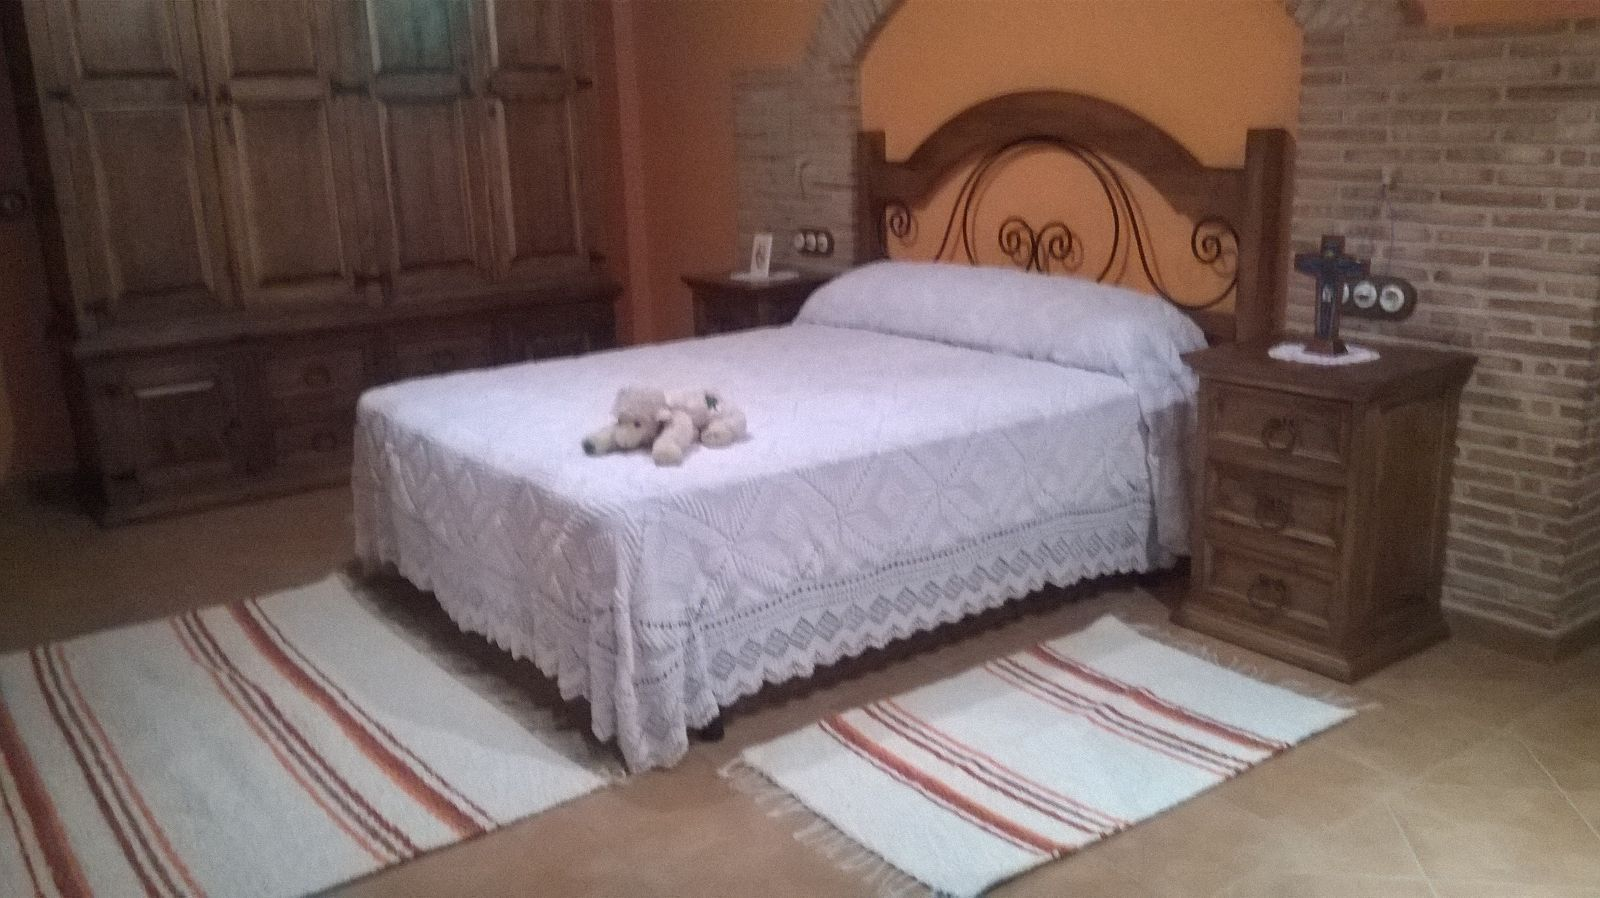 Jarapa, alfombras artesanas alpujarreñas